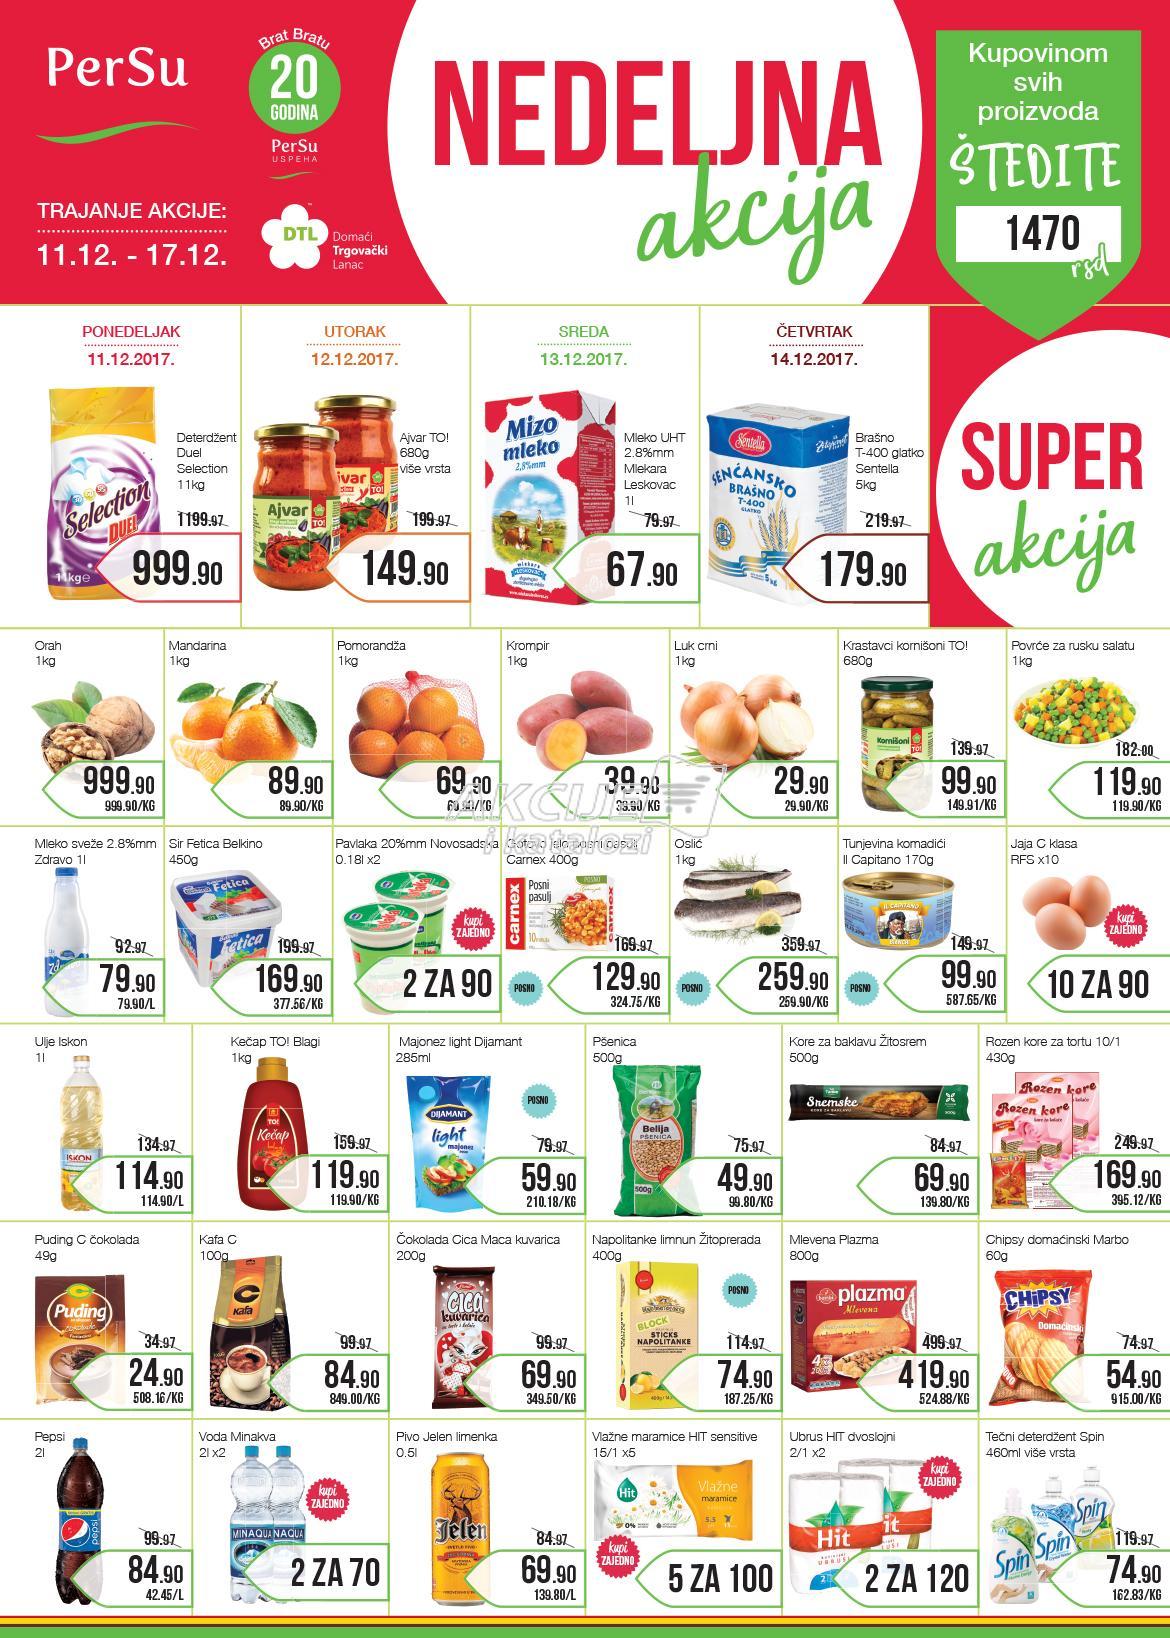 Persu - Redovna akcija nedelja super cena